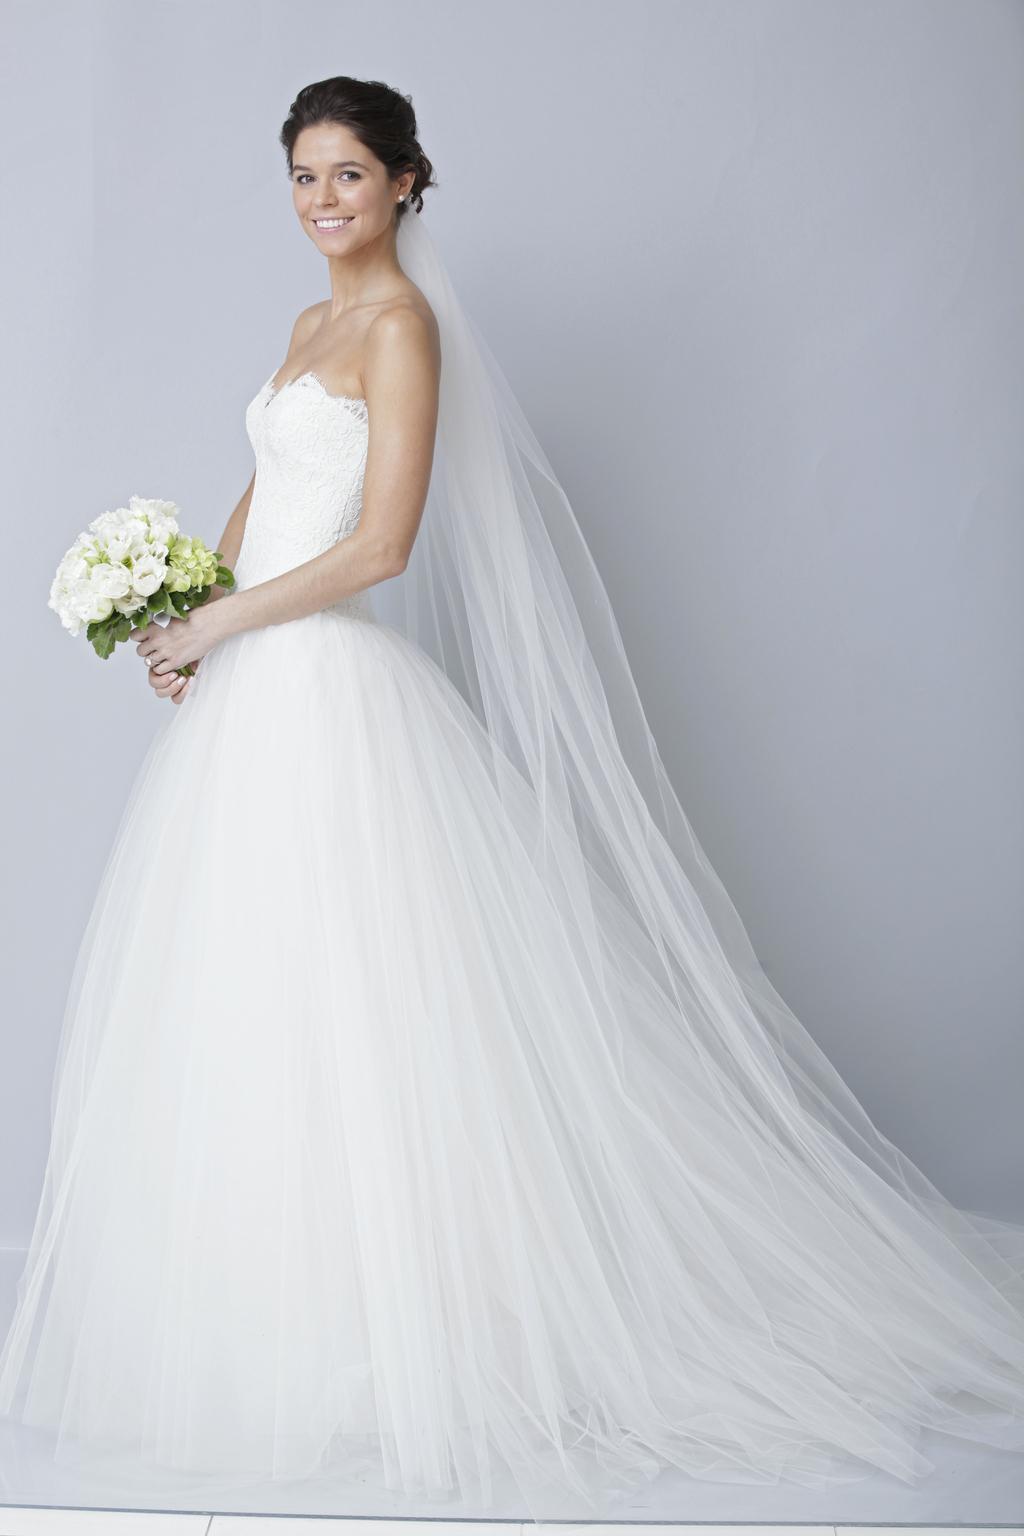 Princess Wedding\' Ideabook by Christina Chin on OneWed